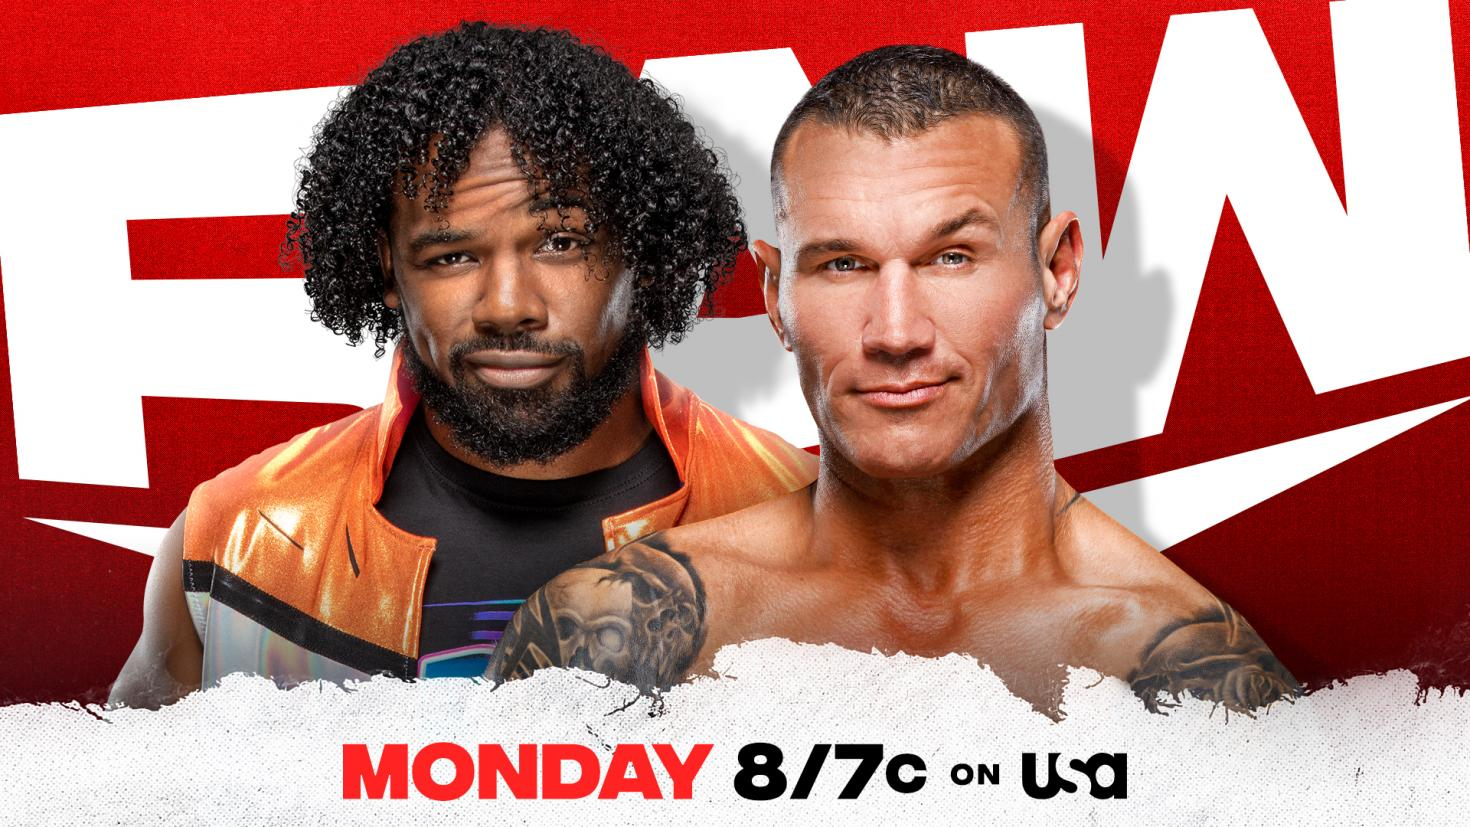 WWE Raw Preview (31/05/21): McIntyre vs Kingston; Intergender Match; Miz TV 101